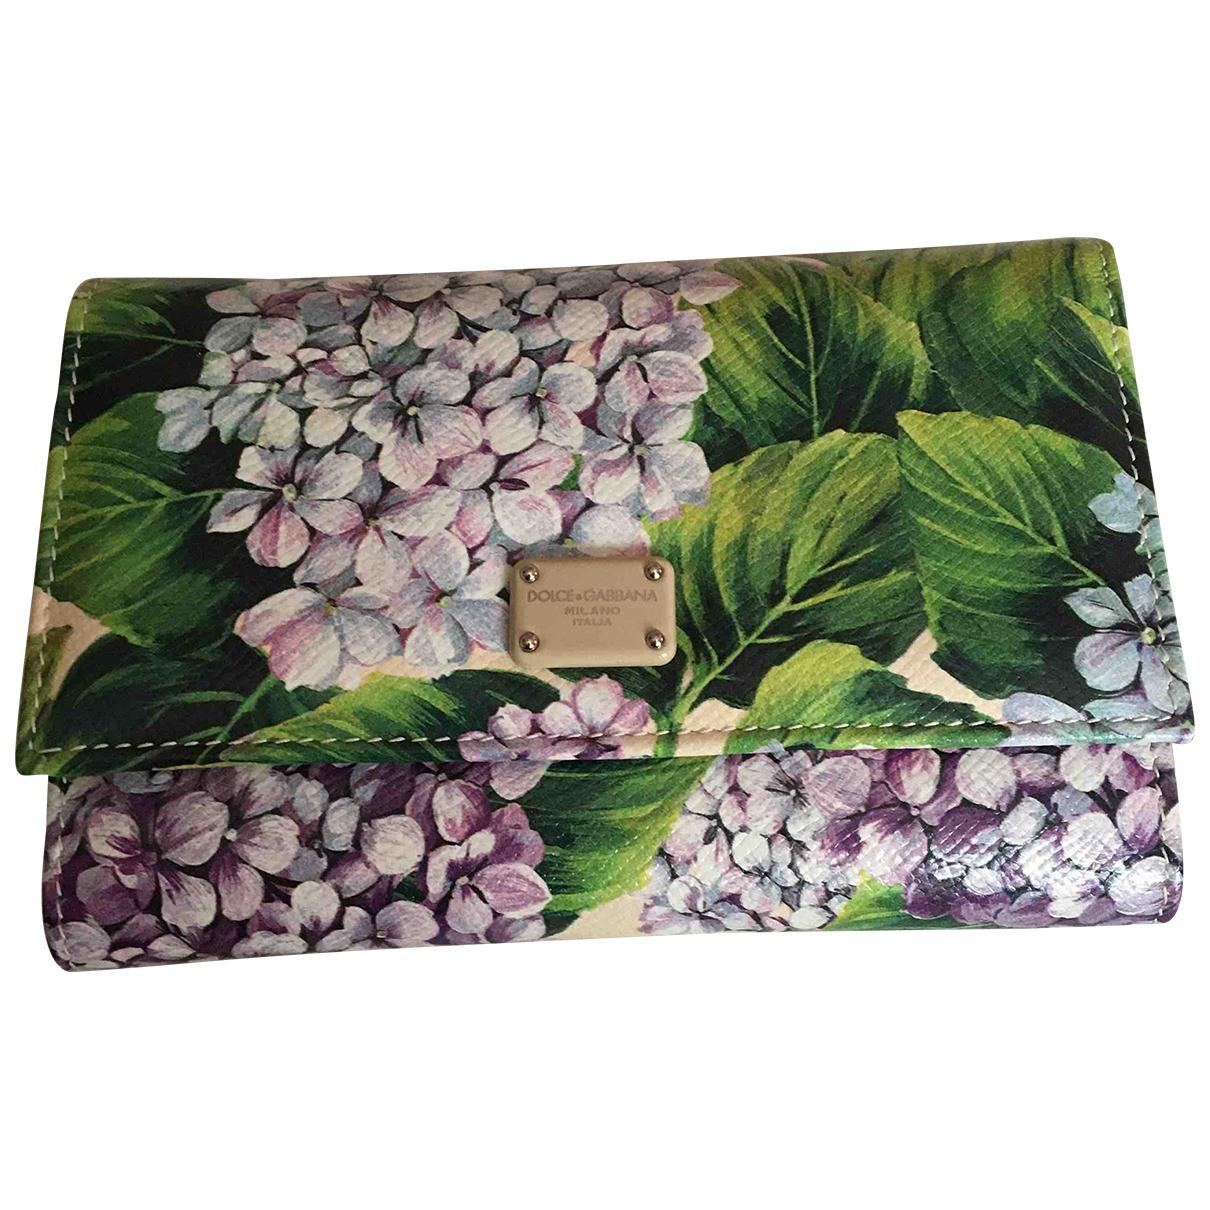 Dolce & Gabbana \N Portemonnaie in  Gruen Leder